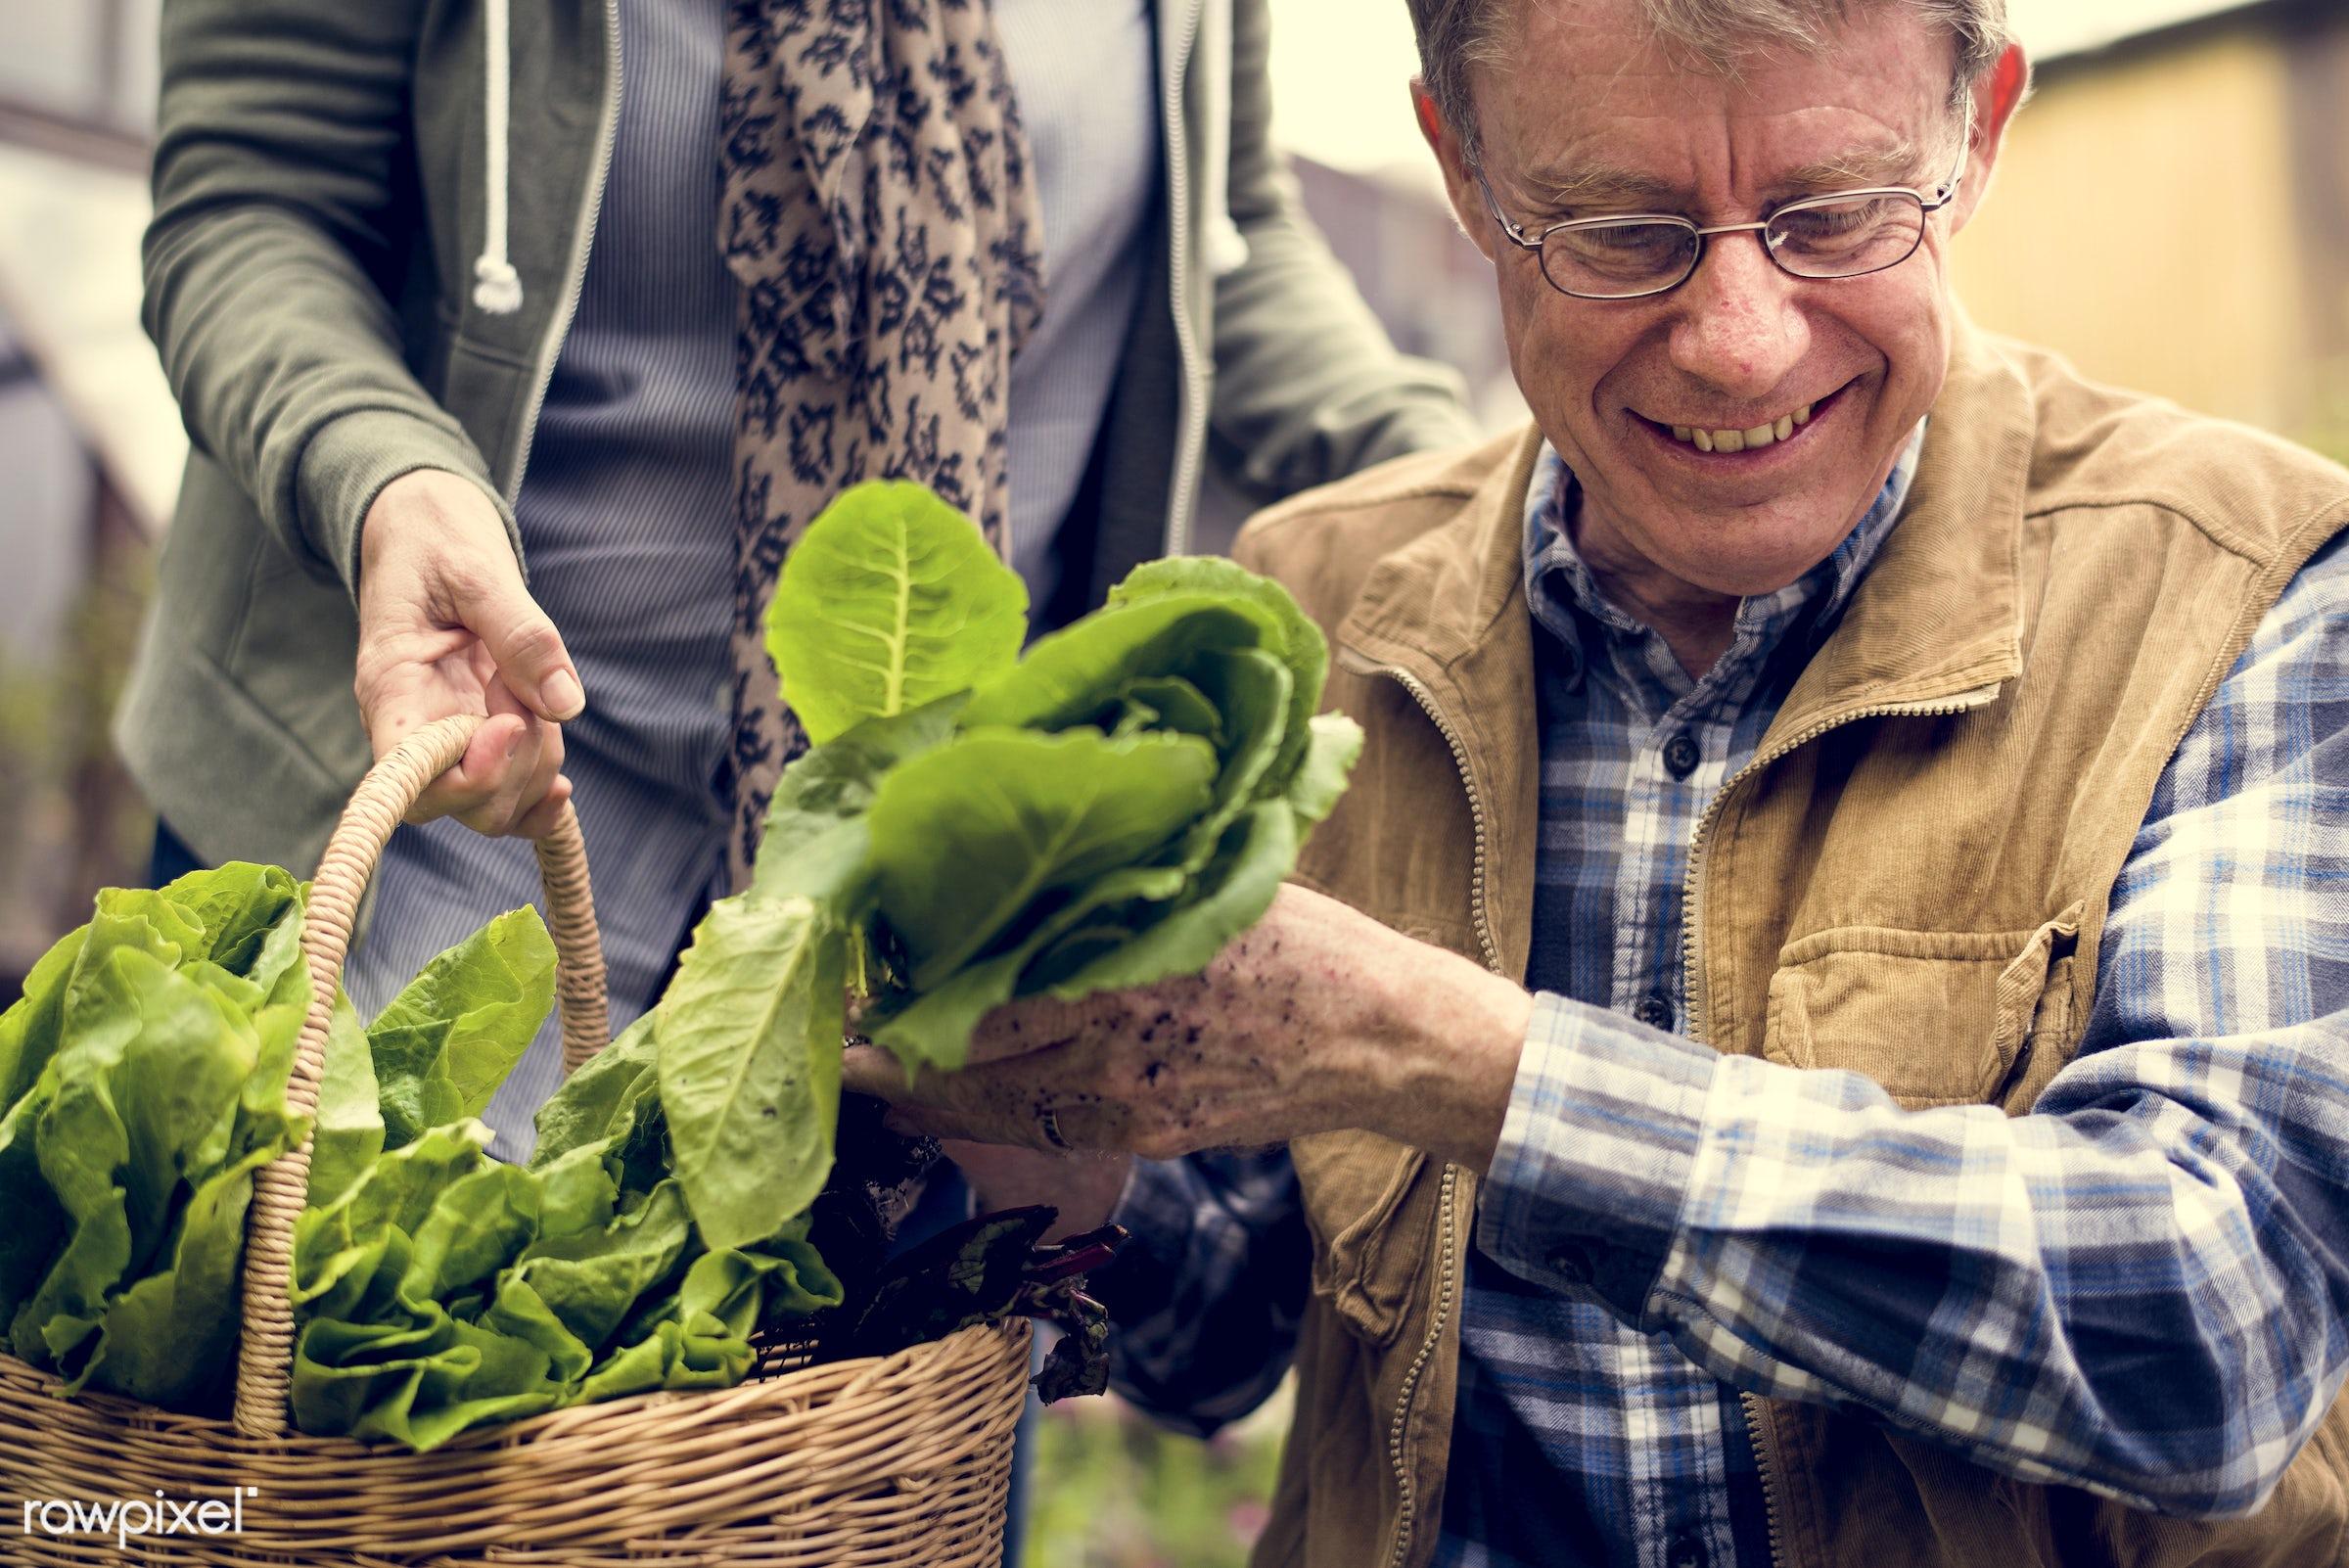 countryside, person, greenhouse, plantation, caucasian, retirement, tree, farmer, nature, woman, lifestyle, backyard,...